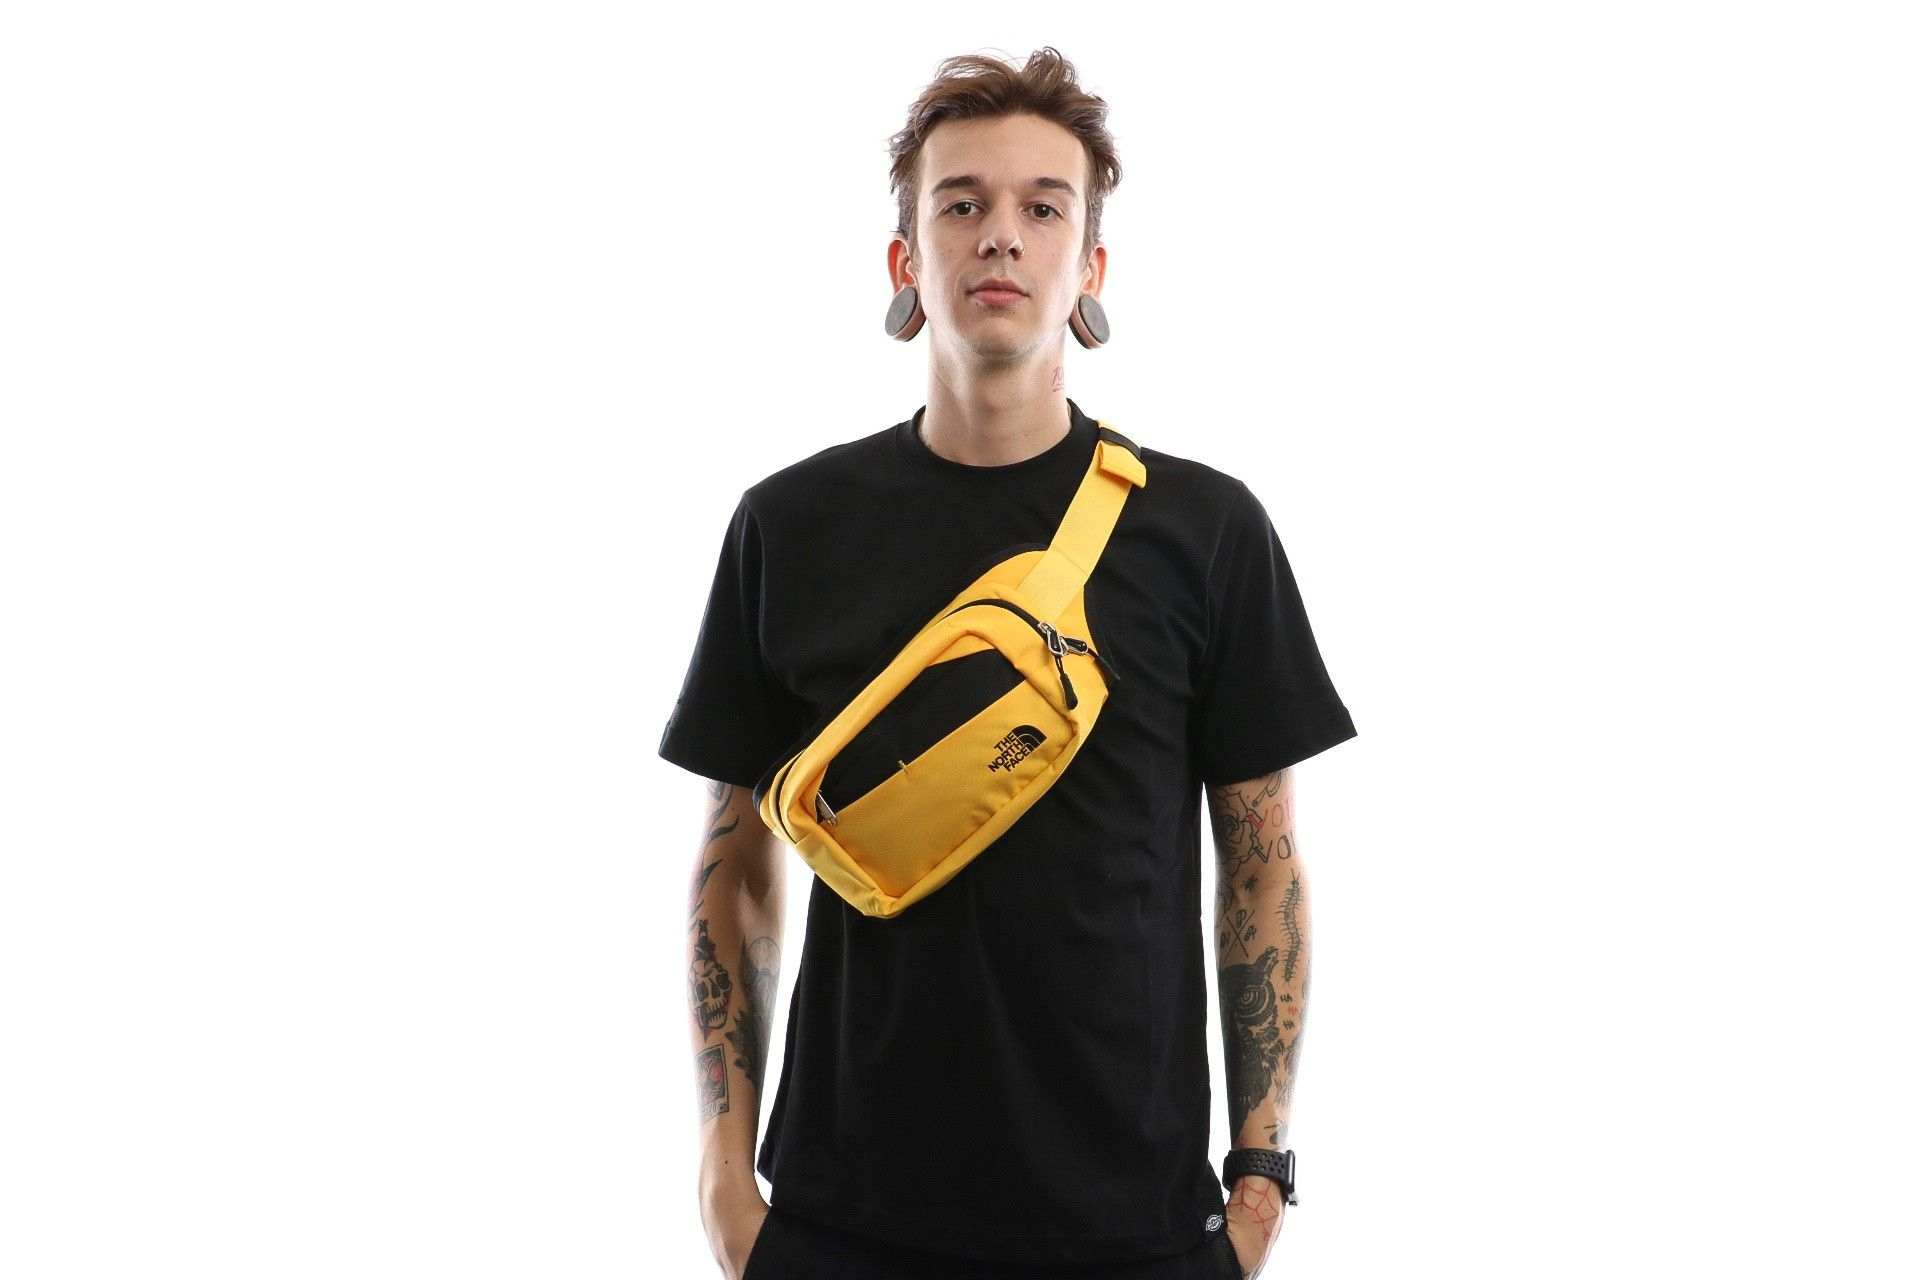 Afbeelding van The North Face Bozer Hip Pack Ii T92Ucxlr0 Heuptas Tnf Yellow/Tnf Black